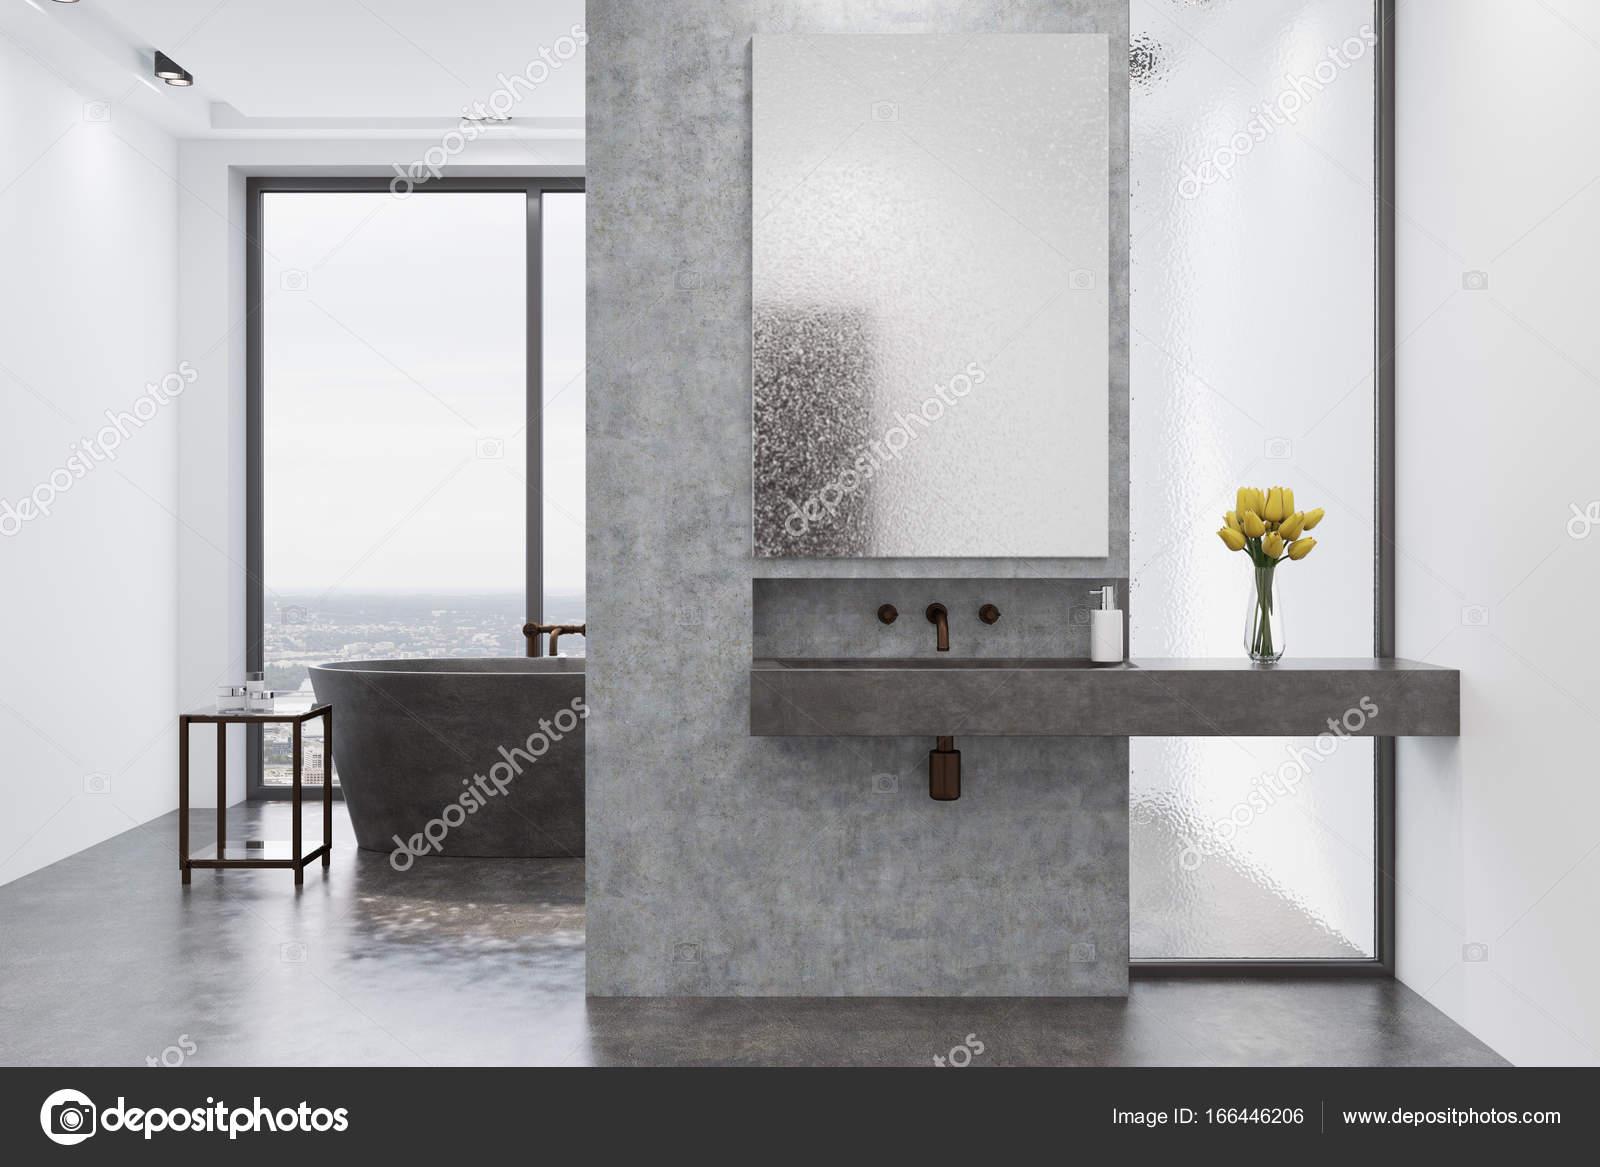 Wasbak Badkamer Grijze : Concrete badkamer grijze badkuip en wastafel u stockfoto